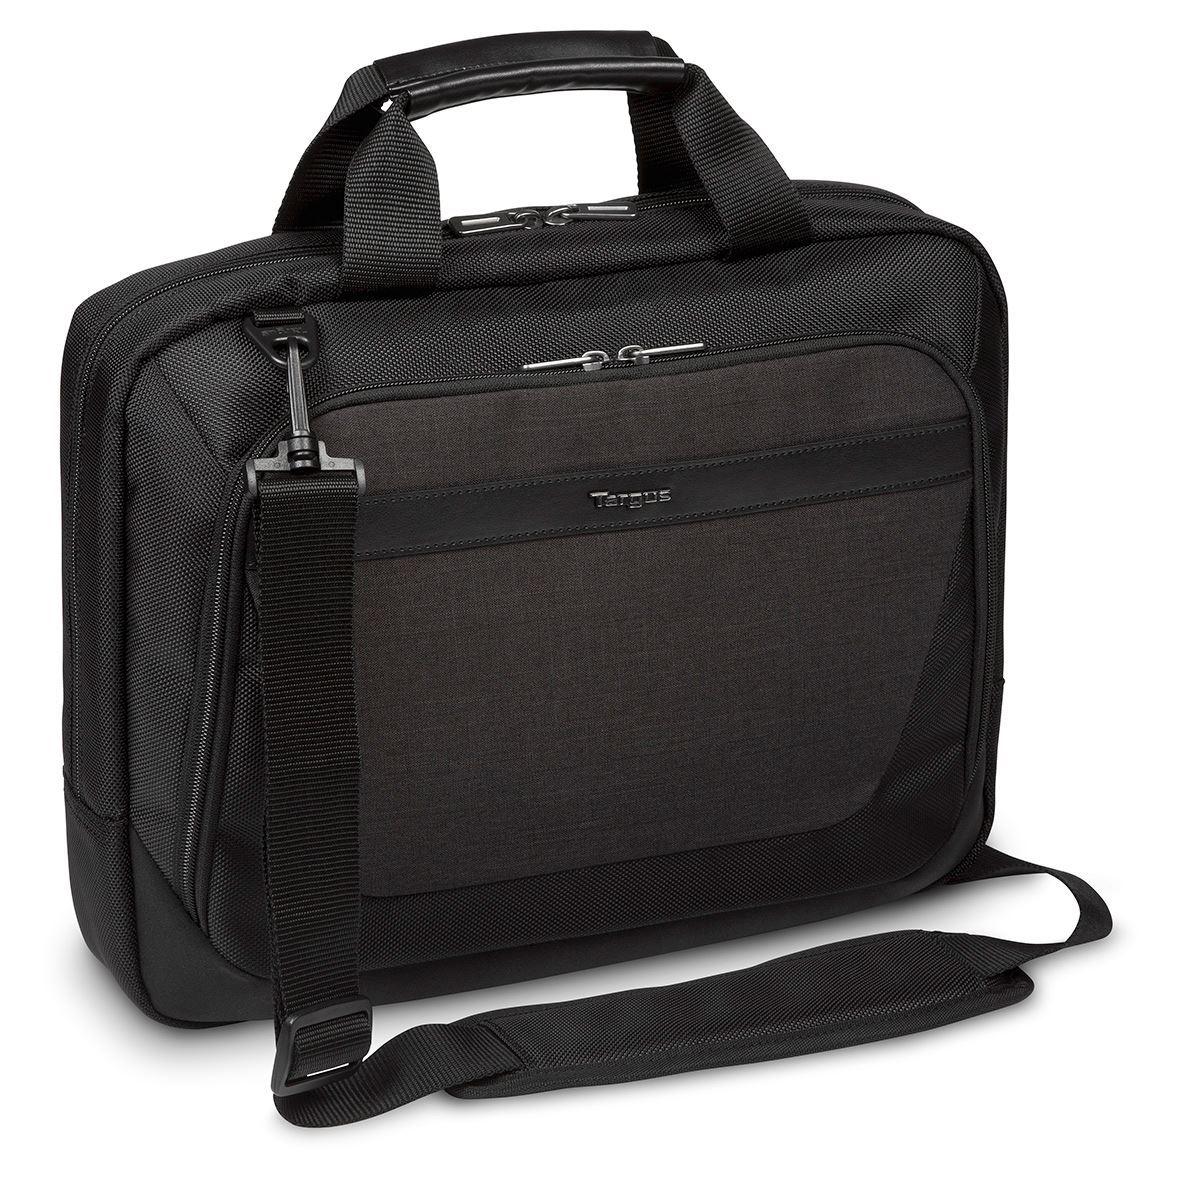 Targus CitySmart 14 Slimline Topload Case Black/Grey (TBT913EU)